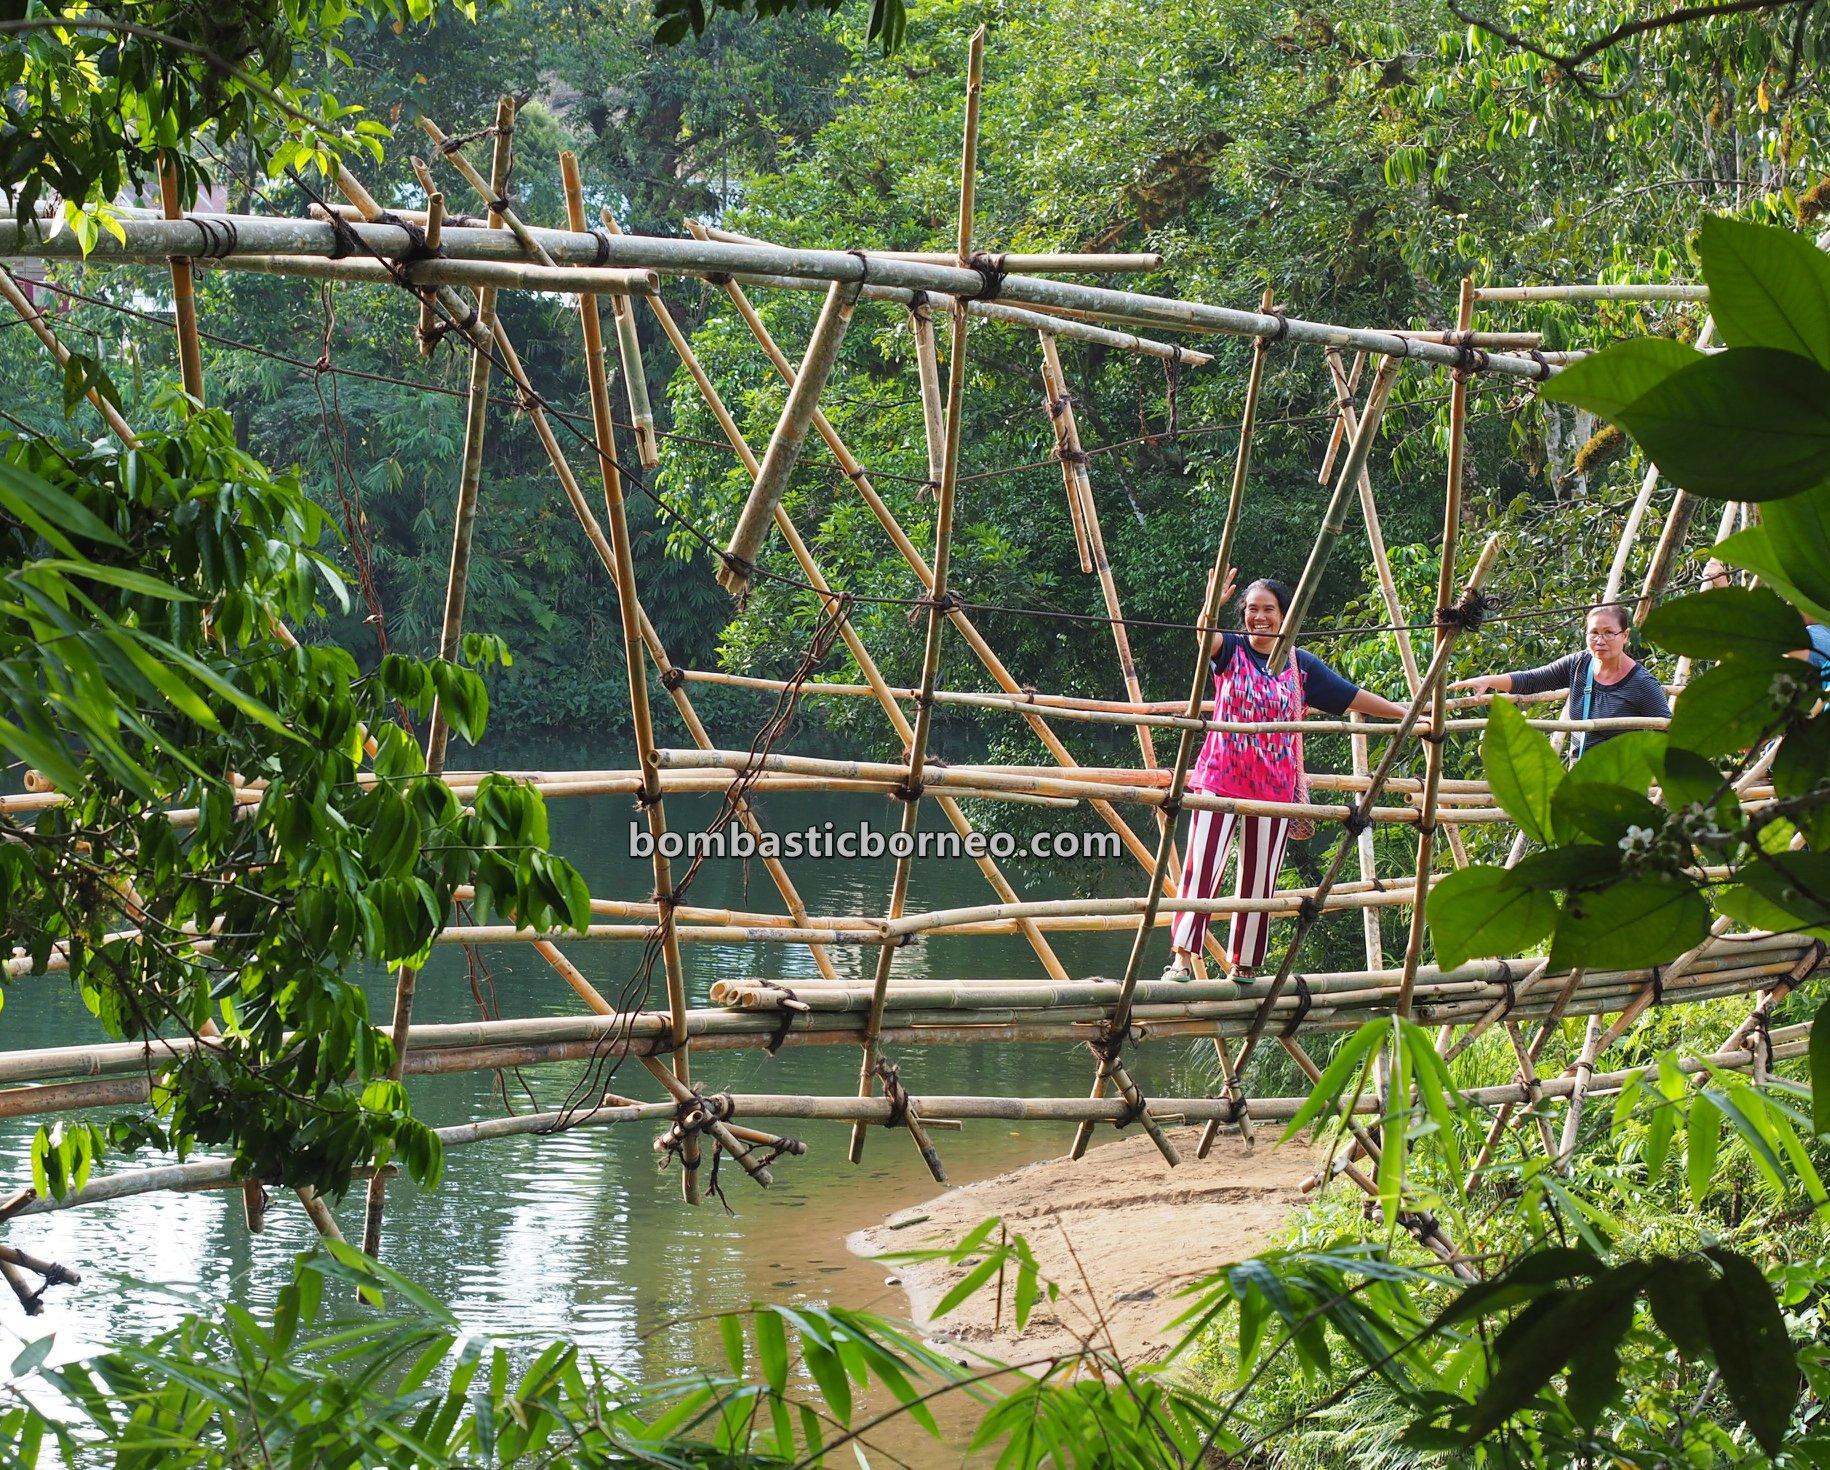 Dusun Medeng, authentic, backpackers, Bengkayang, native, Dayak Bidayuh, village, Gawai harvest festival, Tourism, tourist attraction, Travel guide, Trans Border, Borneo, 穿越婆罗洲土著, 印尼西加里曼丹, 孟加映比达友族,